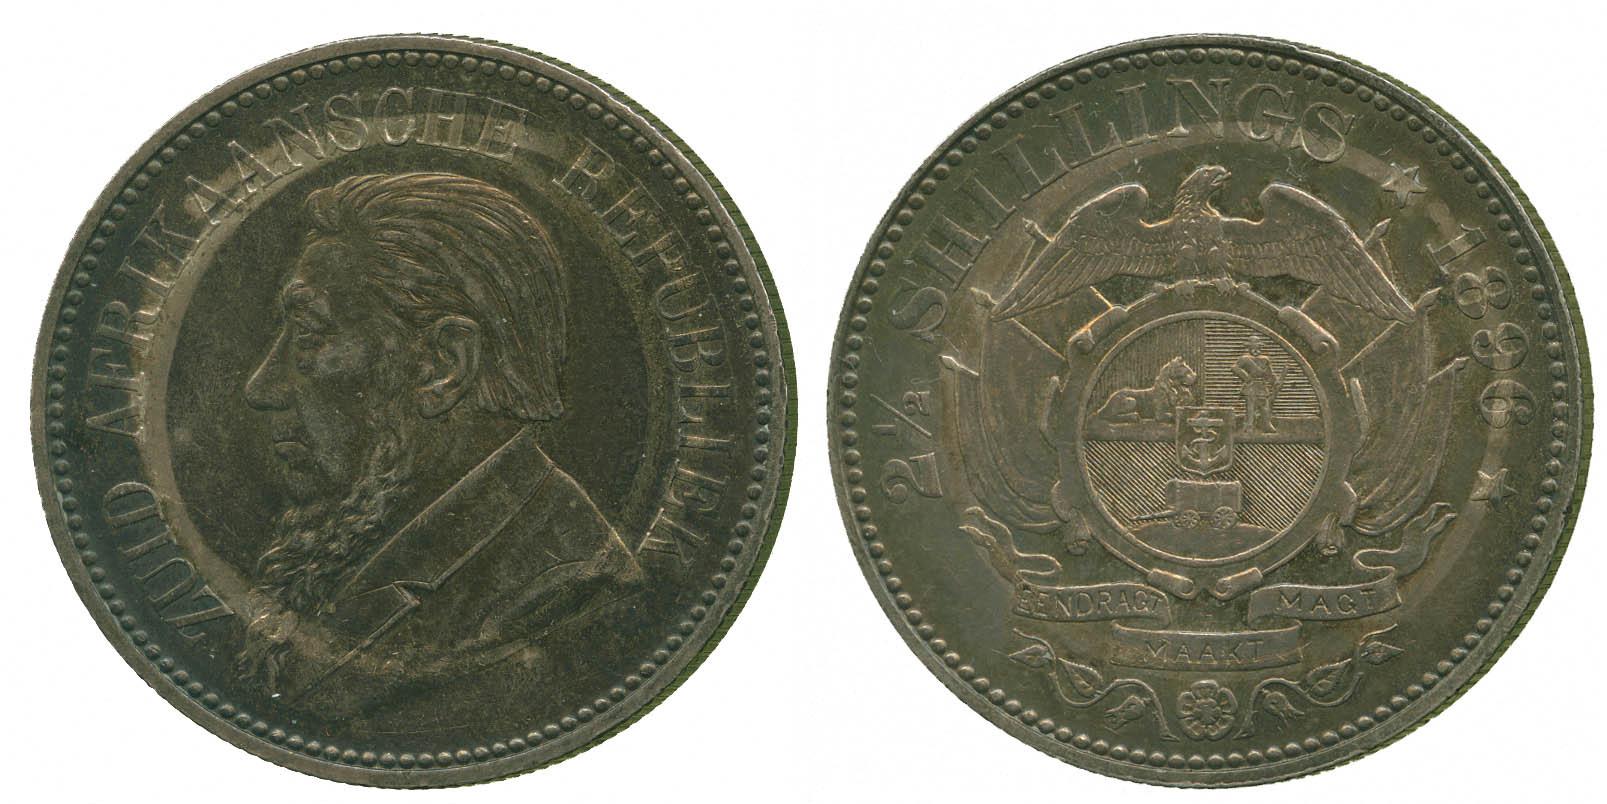 South Africa, Paul Kruger, silver Halfcrown, 1896